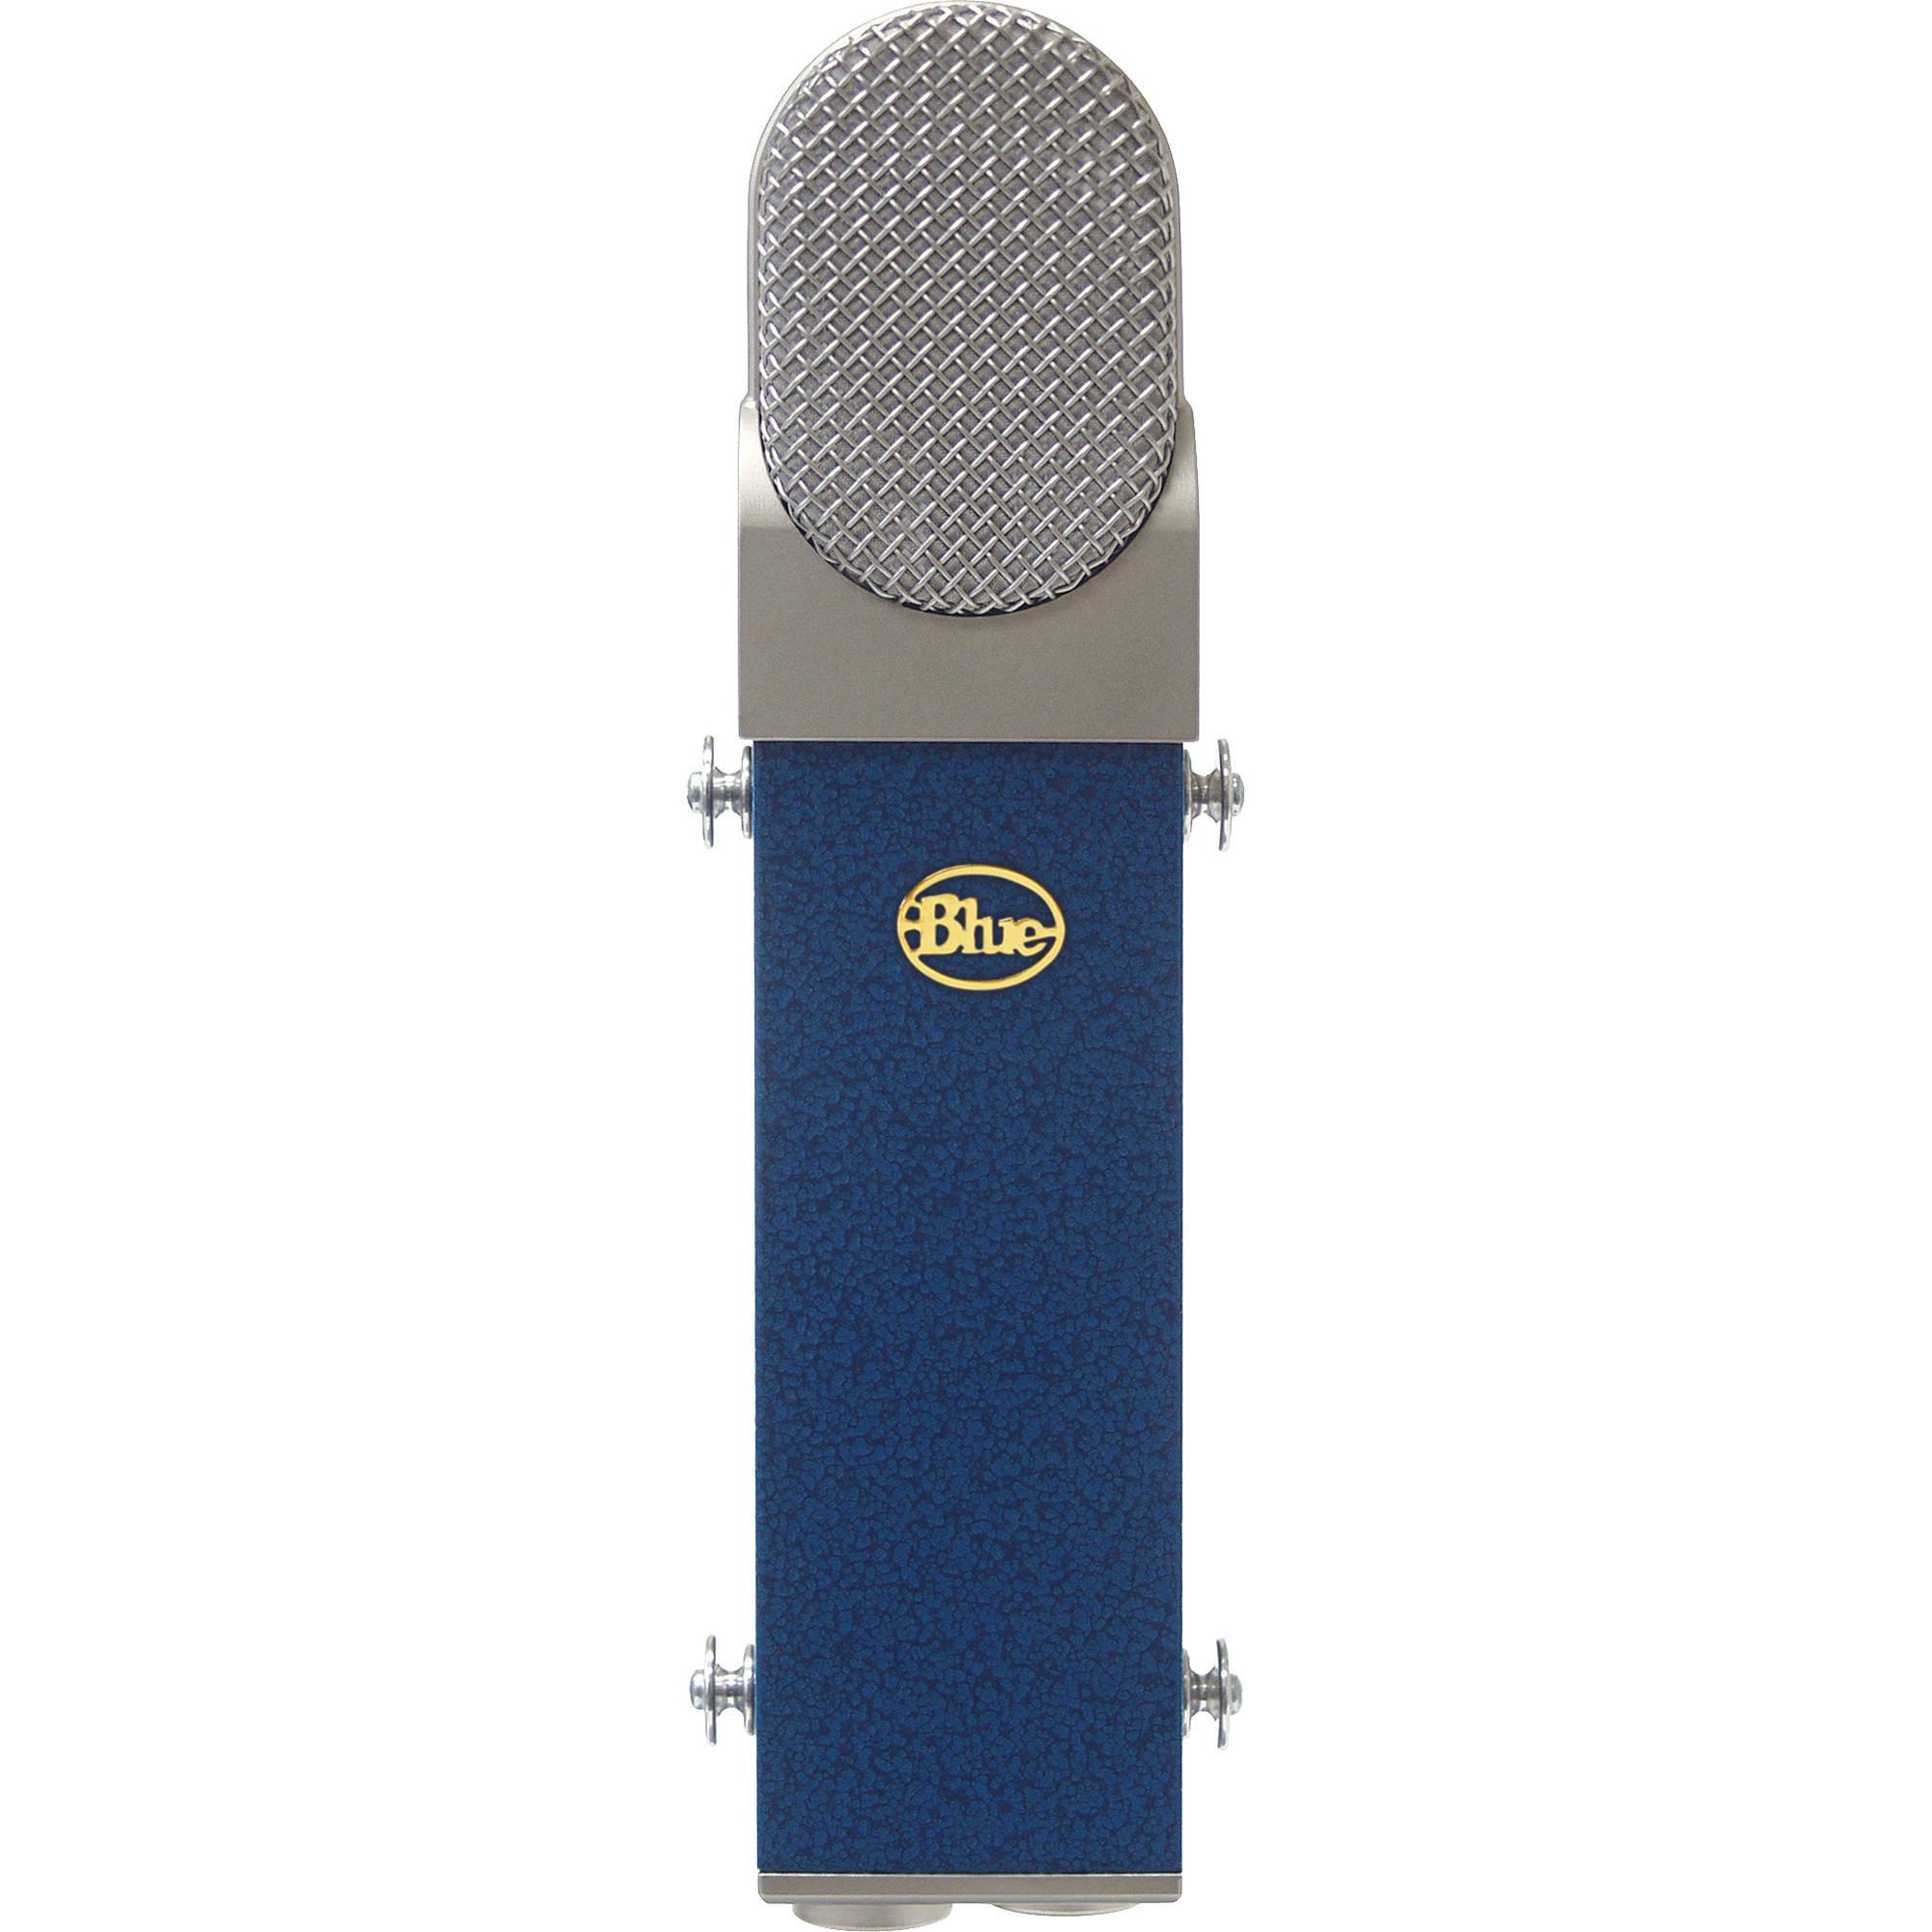 Blueberry - Cardioid Studio Condenser Large Diaphragm Microphone